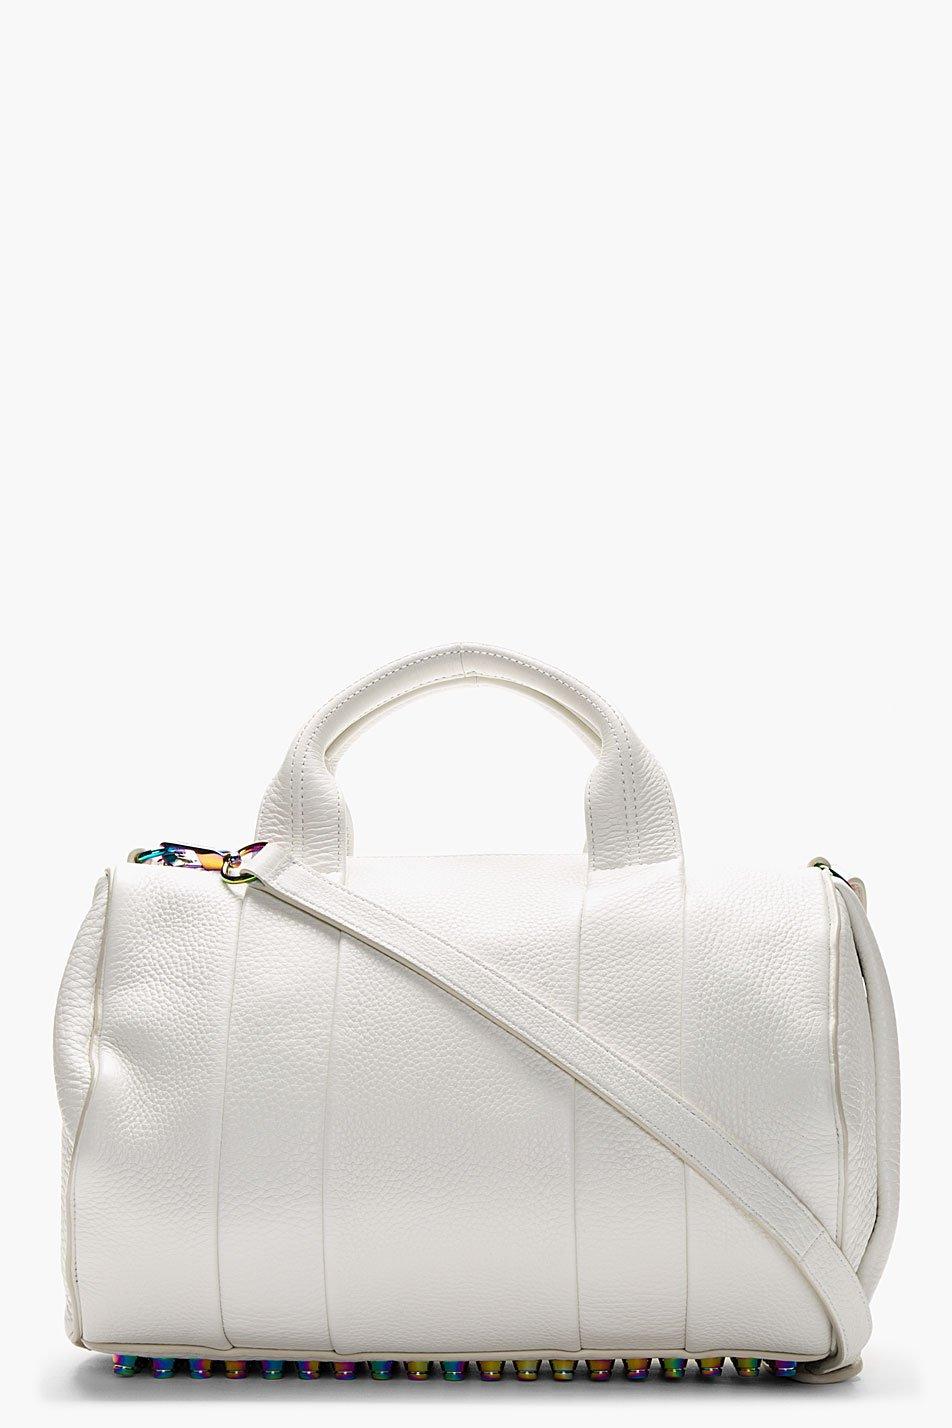 Alexander wang white pebbled lambskin rocco handbag